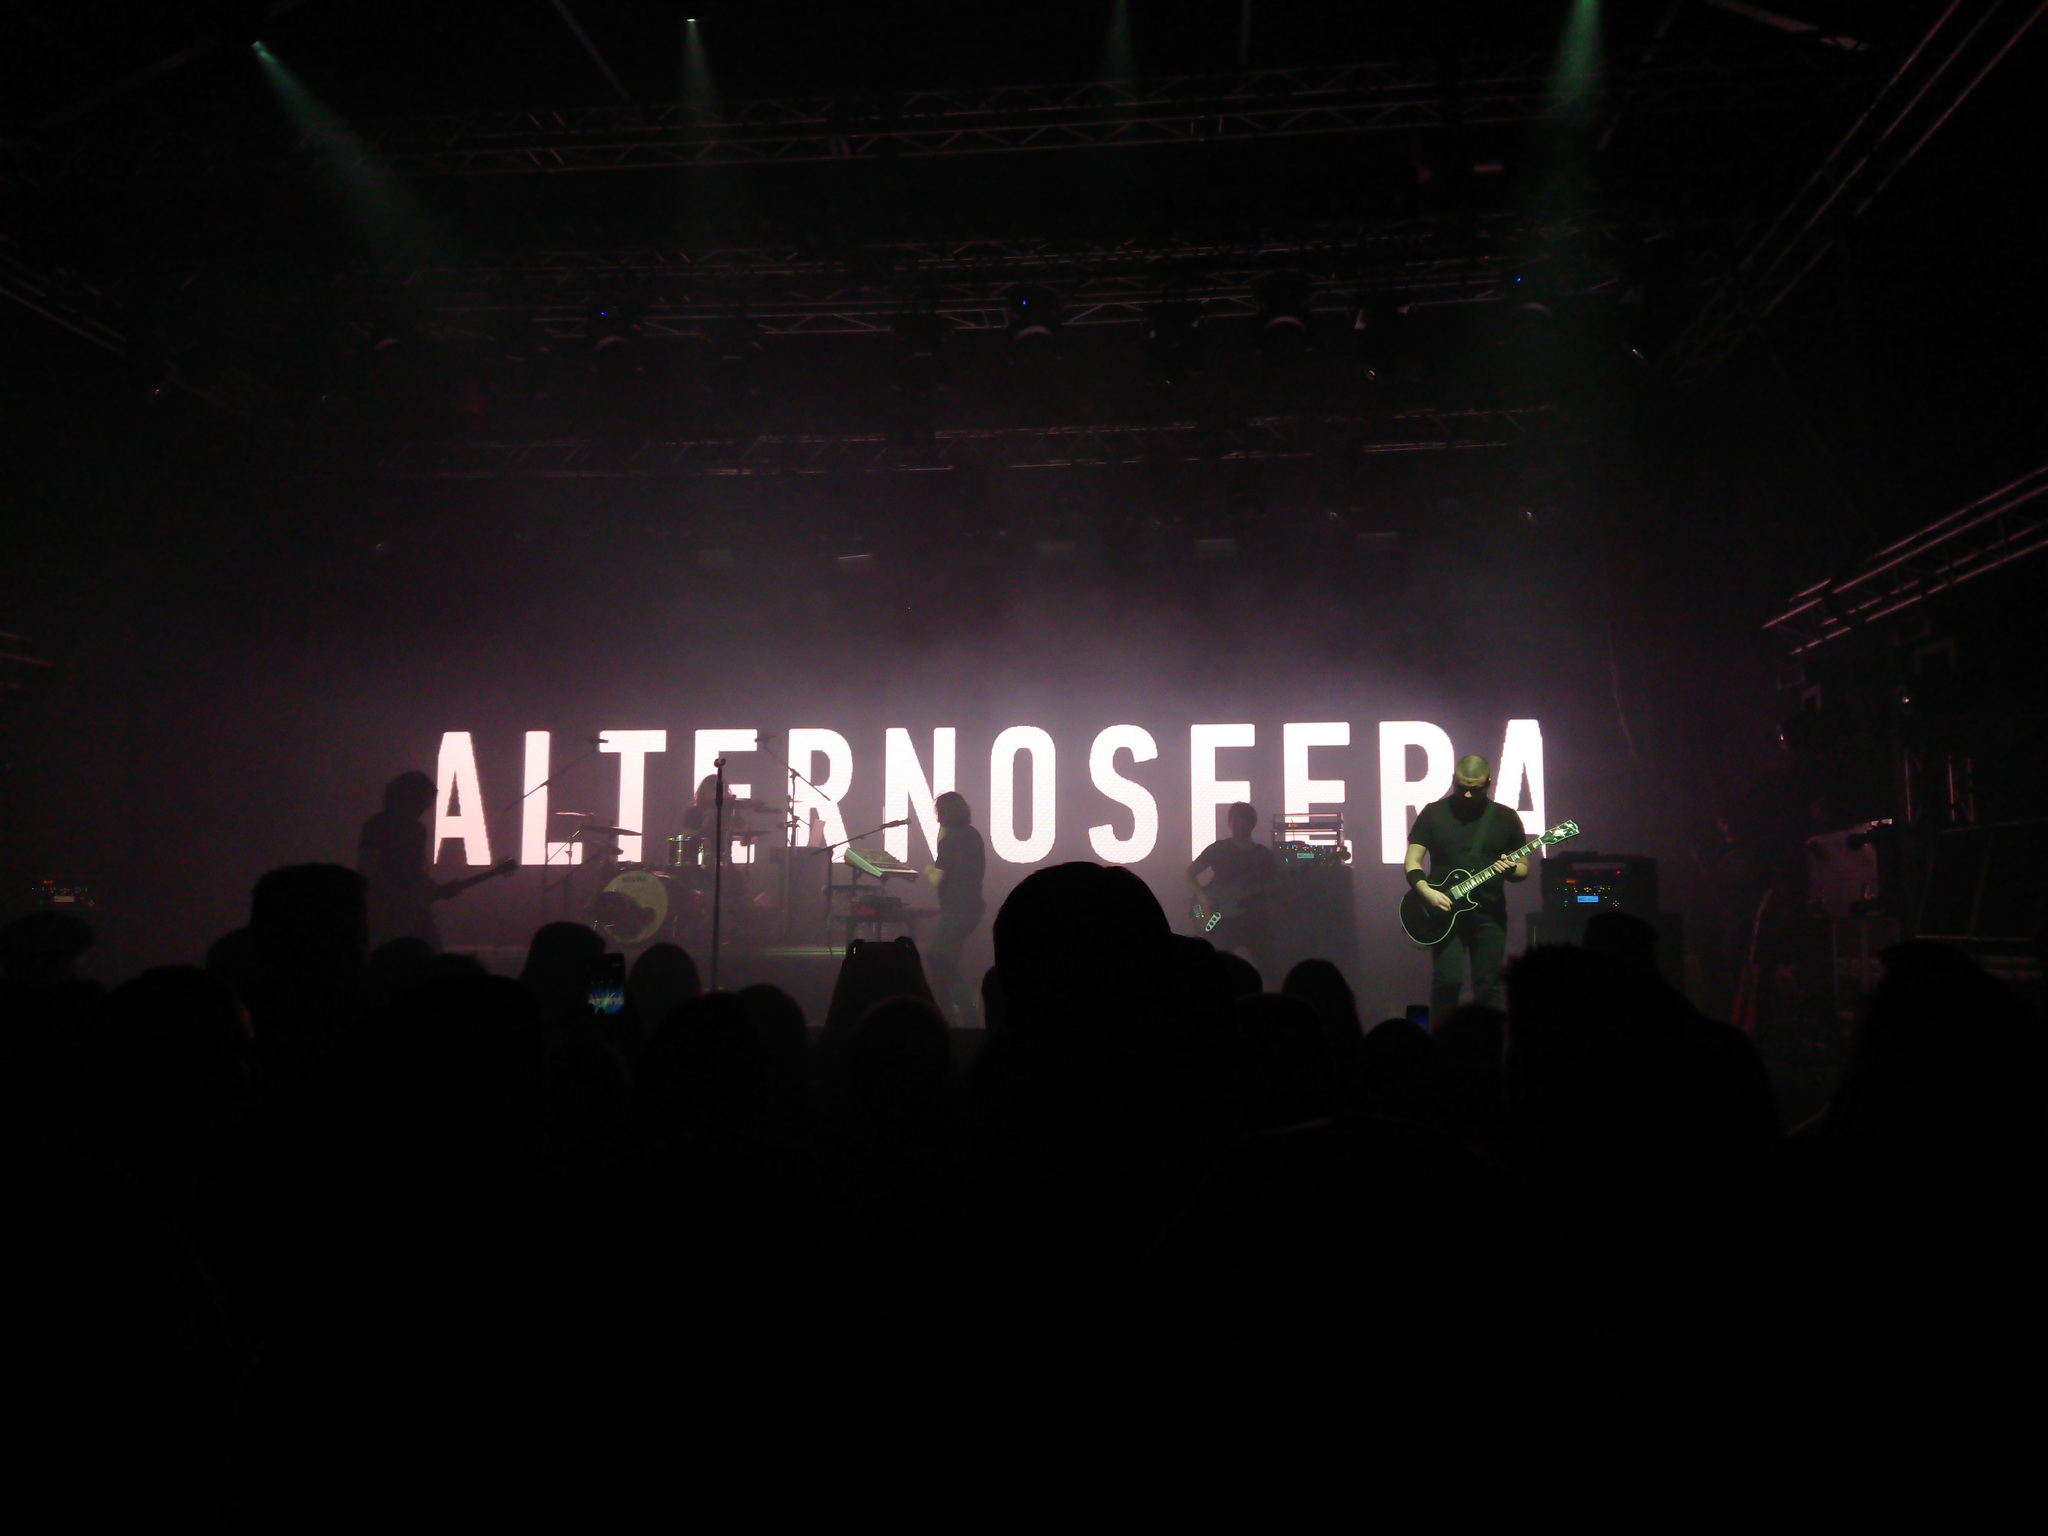 Alternosfera (23.02.2019)